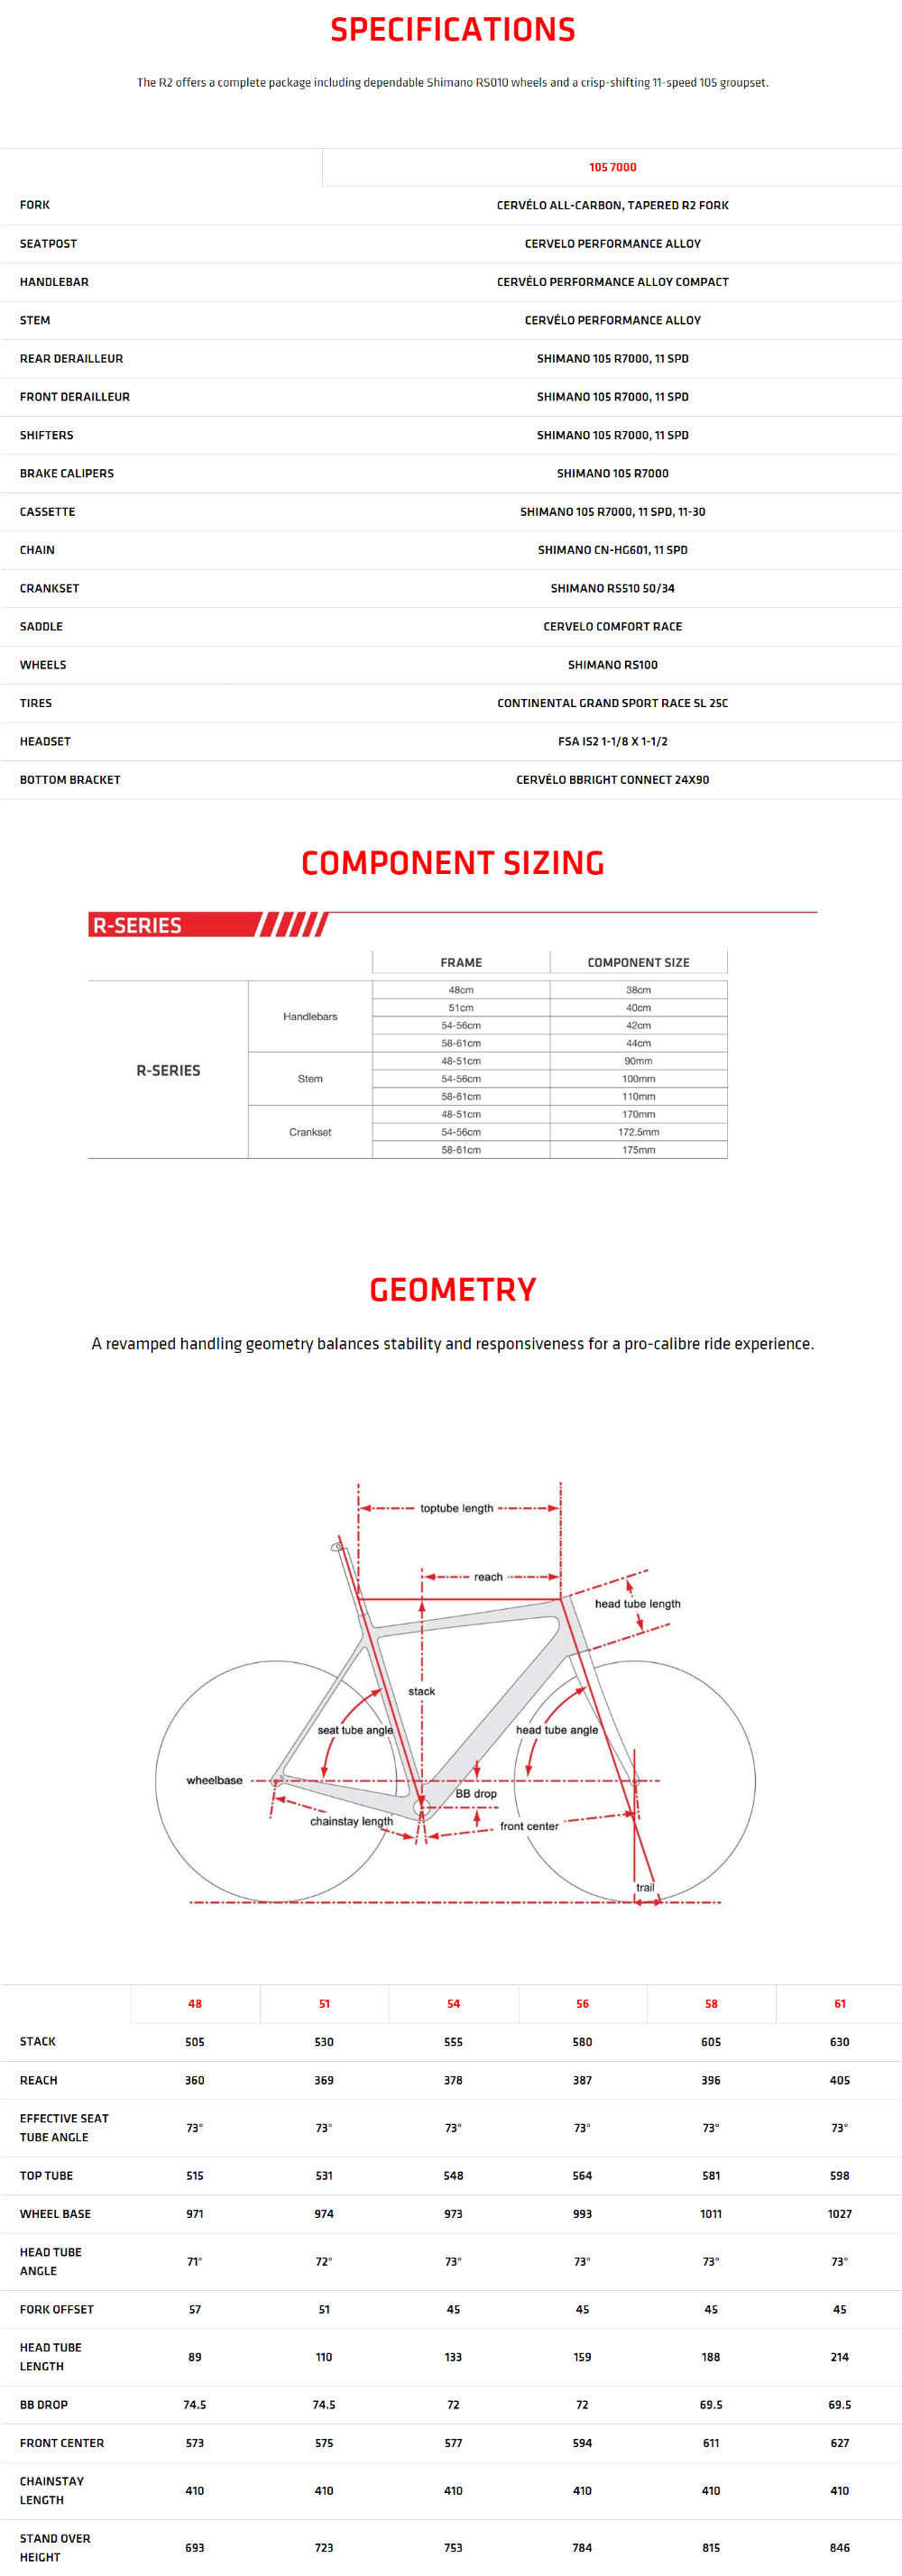 FireShot Capture 38 - Cervélo R2 Specs & Geometry - cervelo._ - https___www.cervelo.com_en_road_r-.png